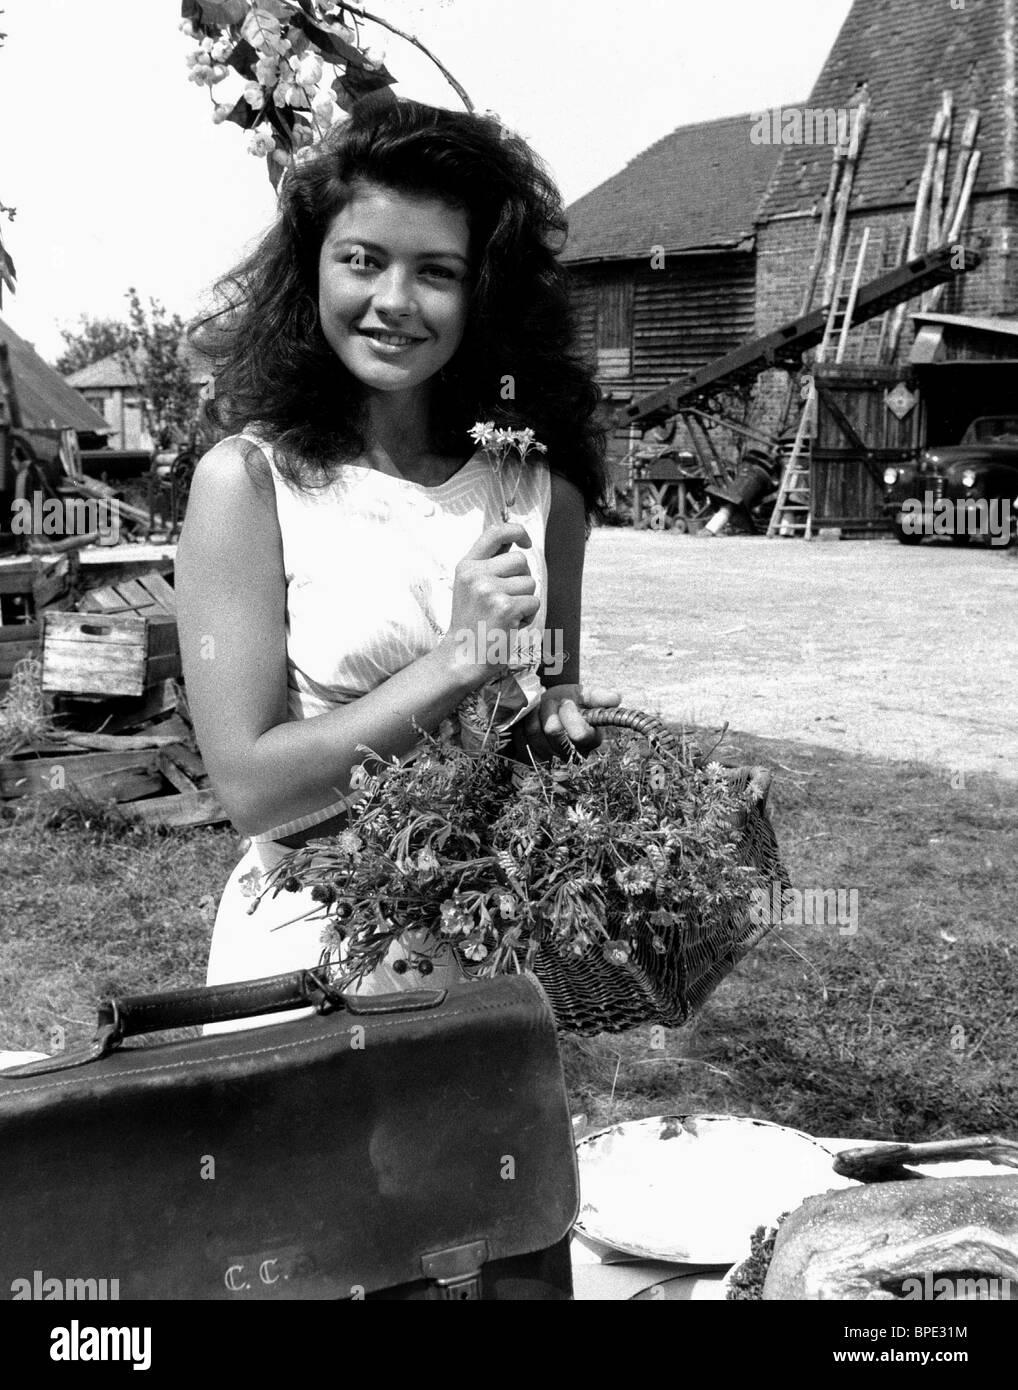 CATHERINE ZETA JONES THE DARLING BUDS OF MAY (1992) - Stock Image